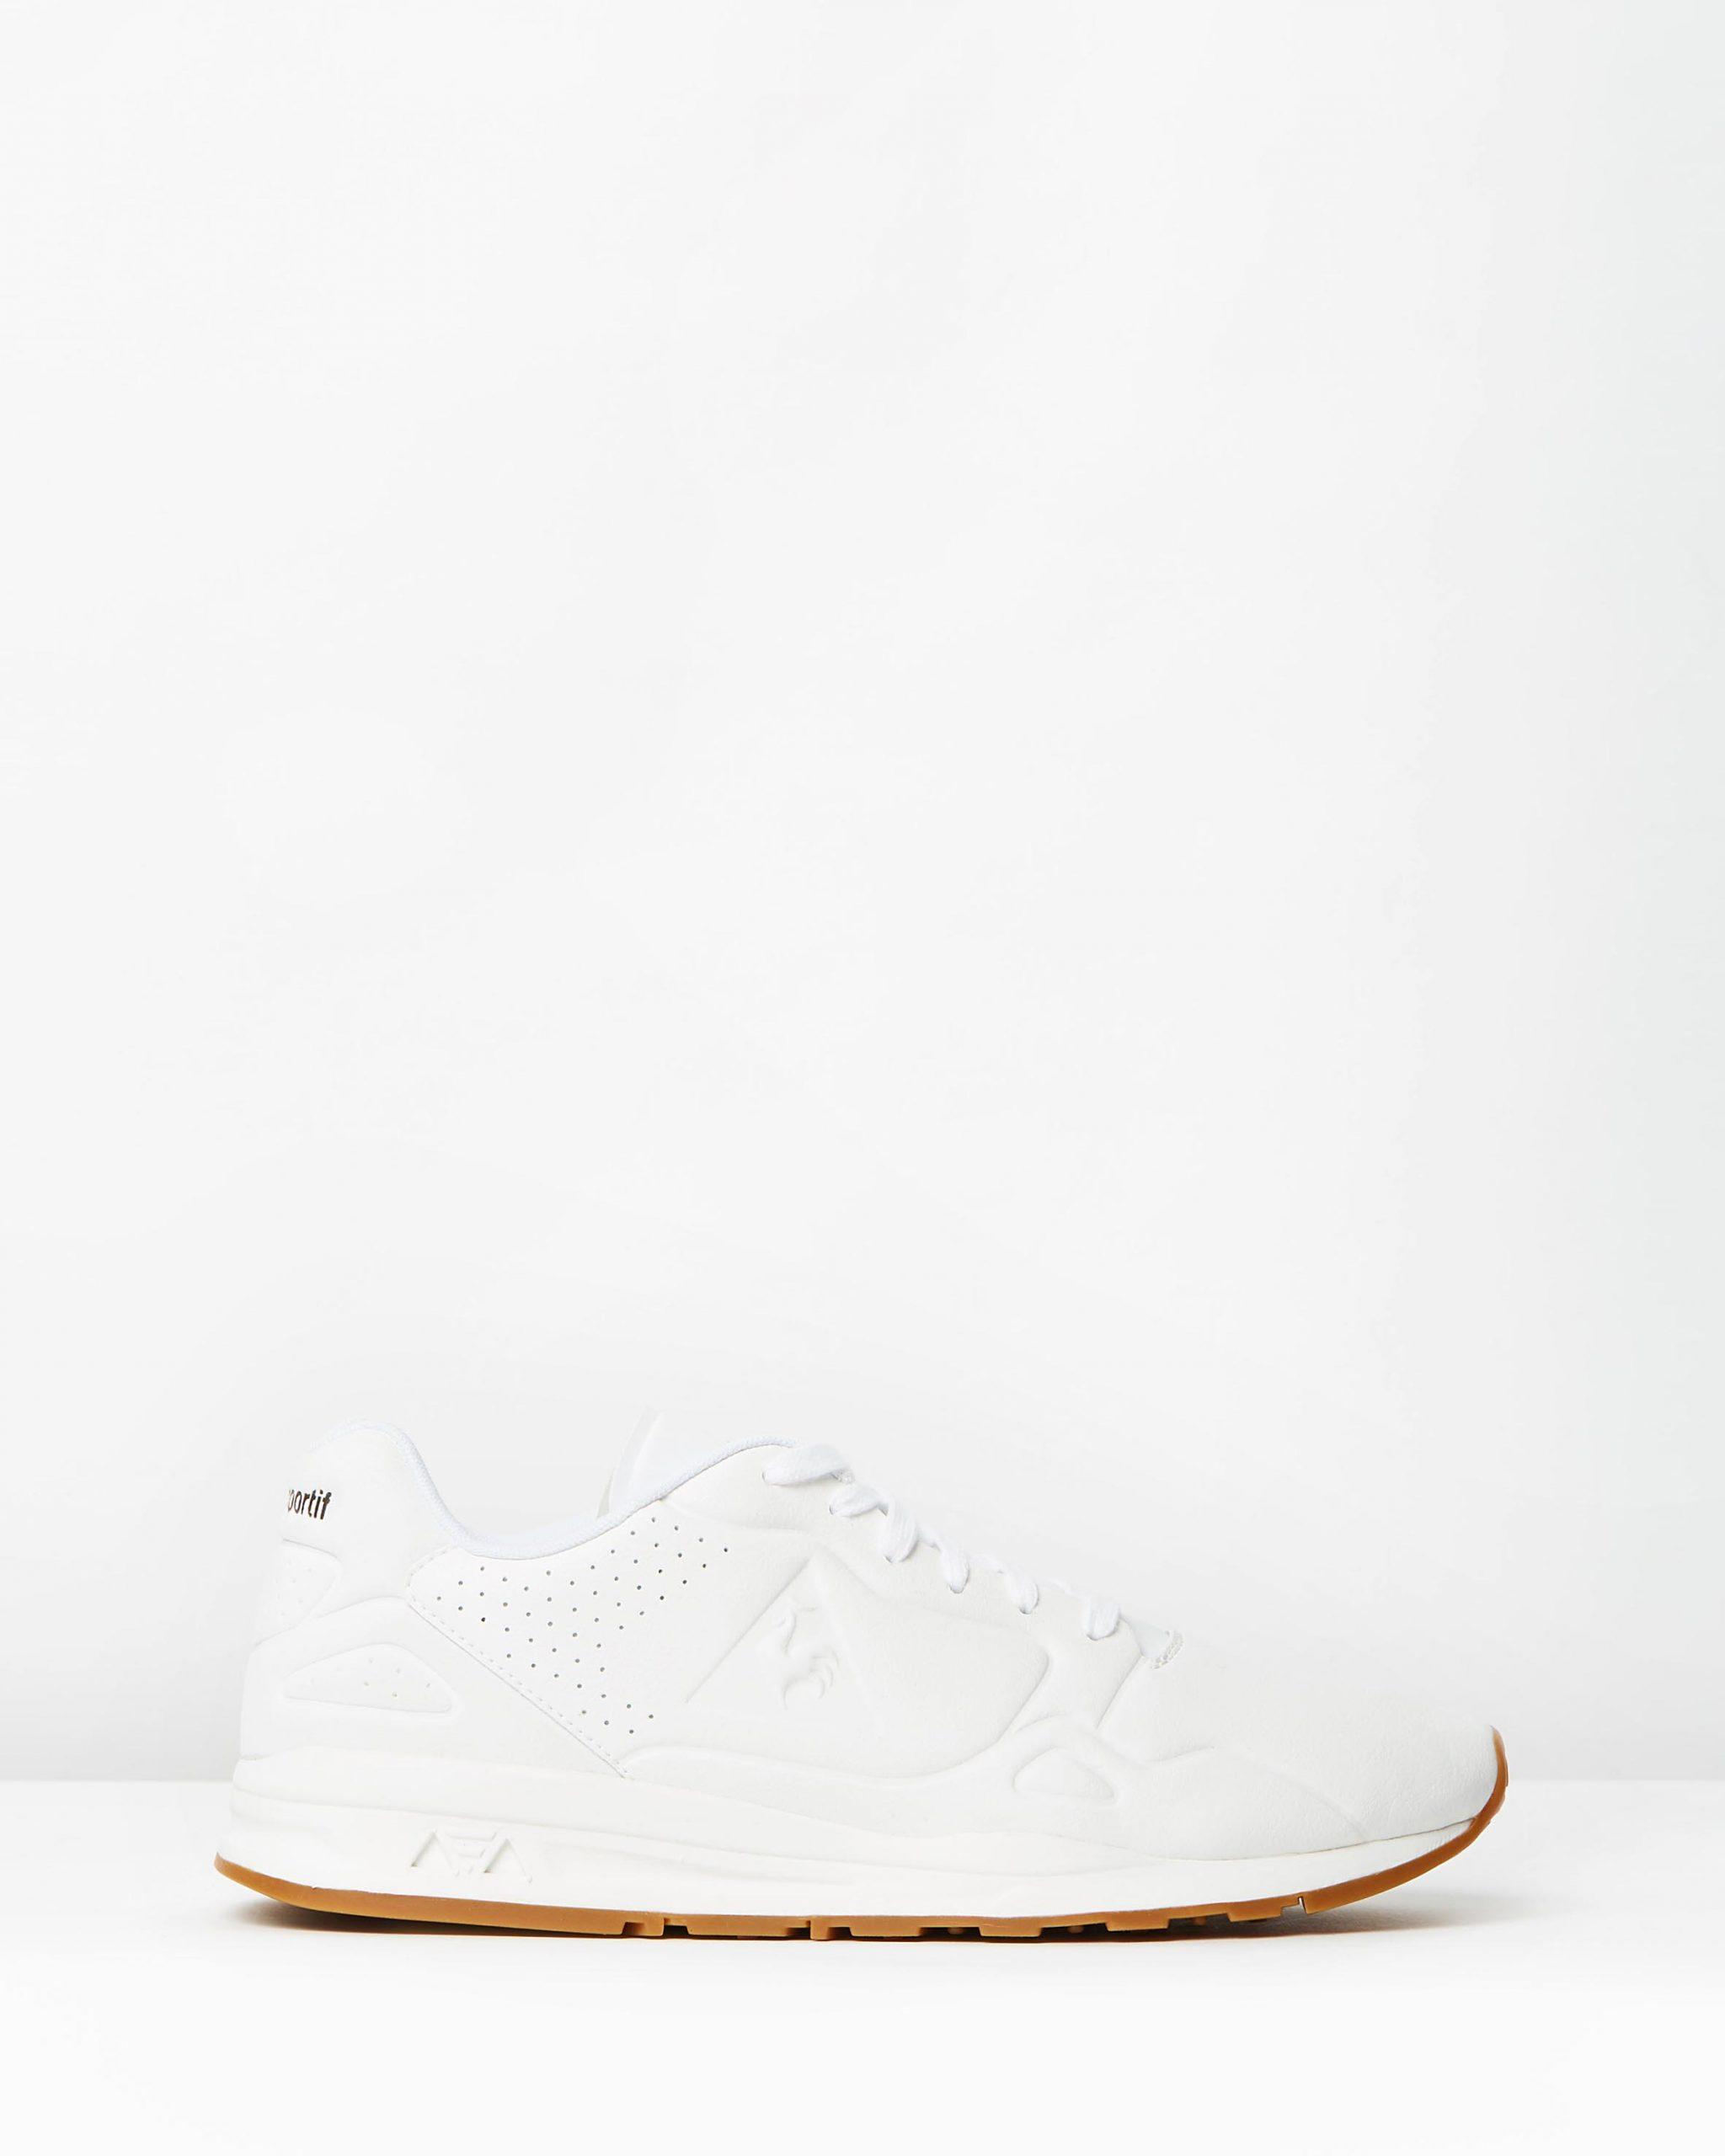 Le Coq Sportif LCS R9xx Sneakers